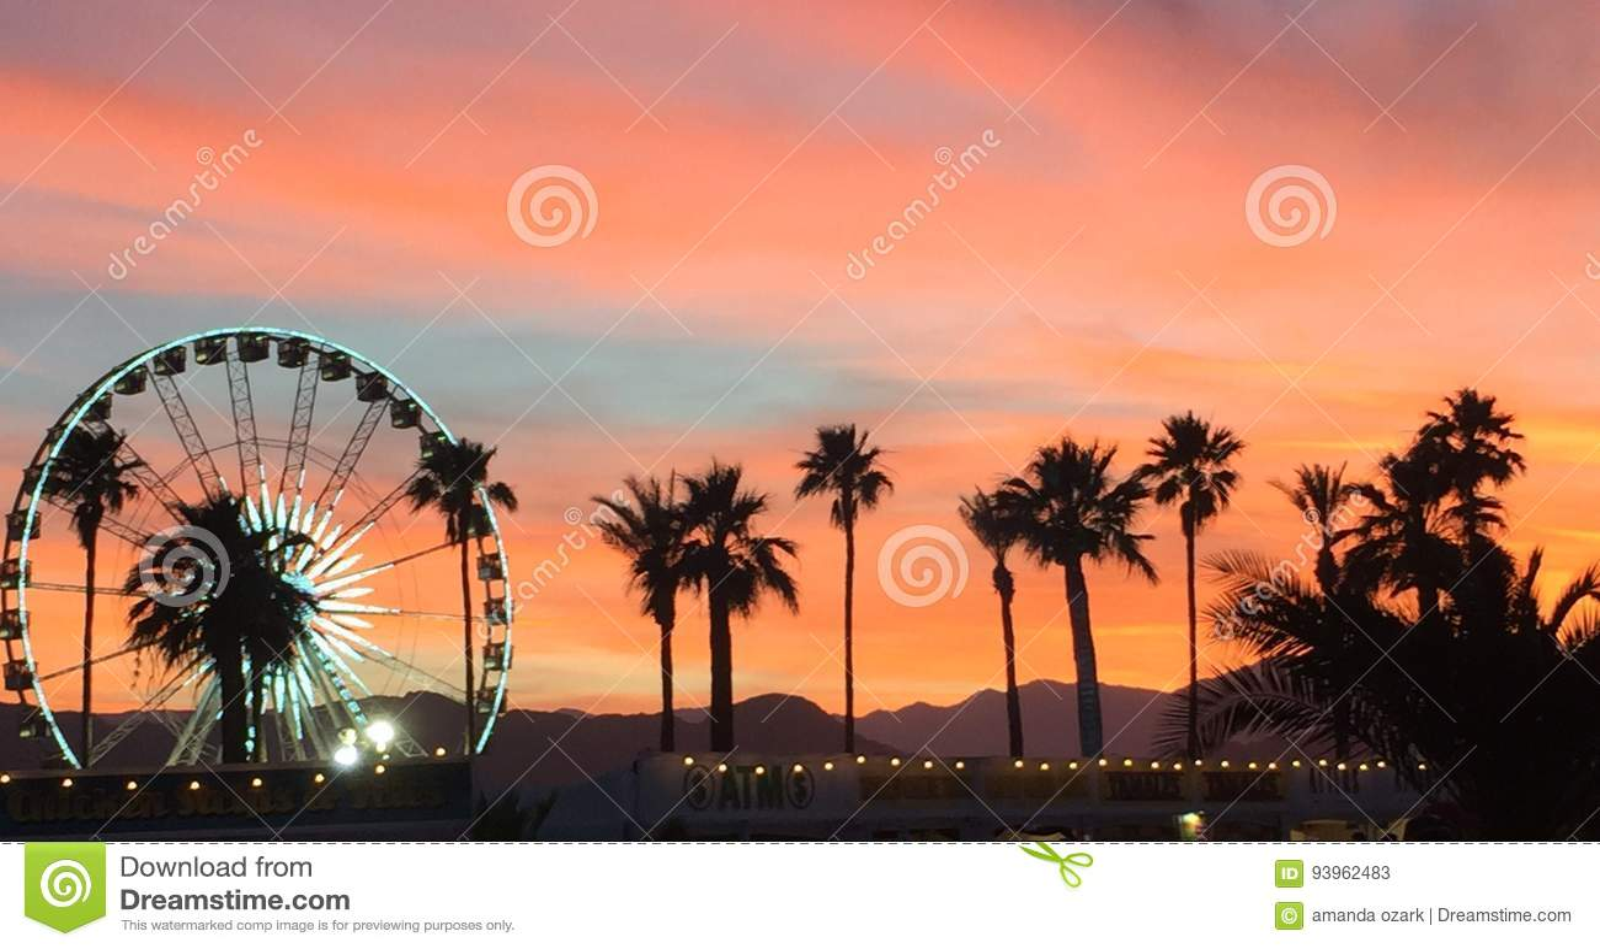 Coachella Ferris Photos Free Royalty Free Stock Photos From Dreamstime